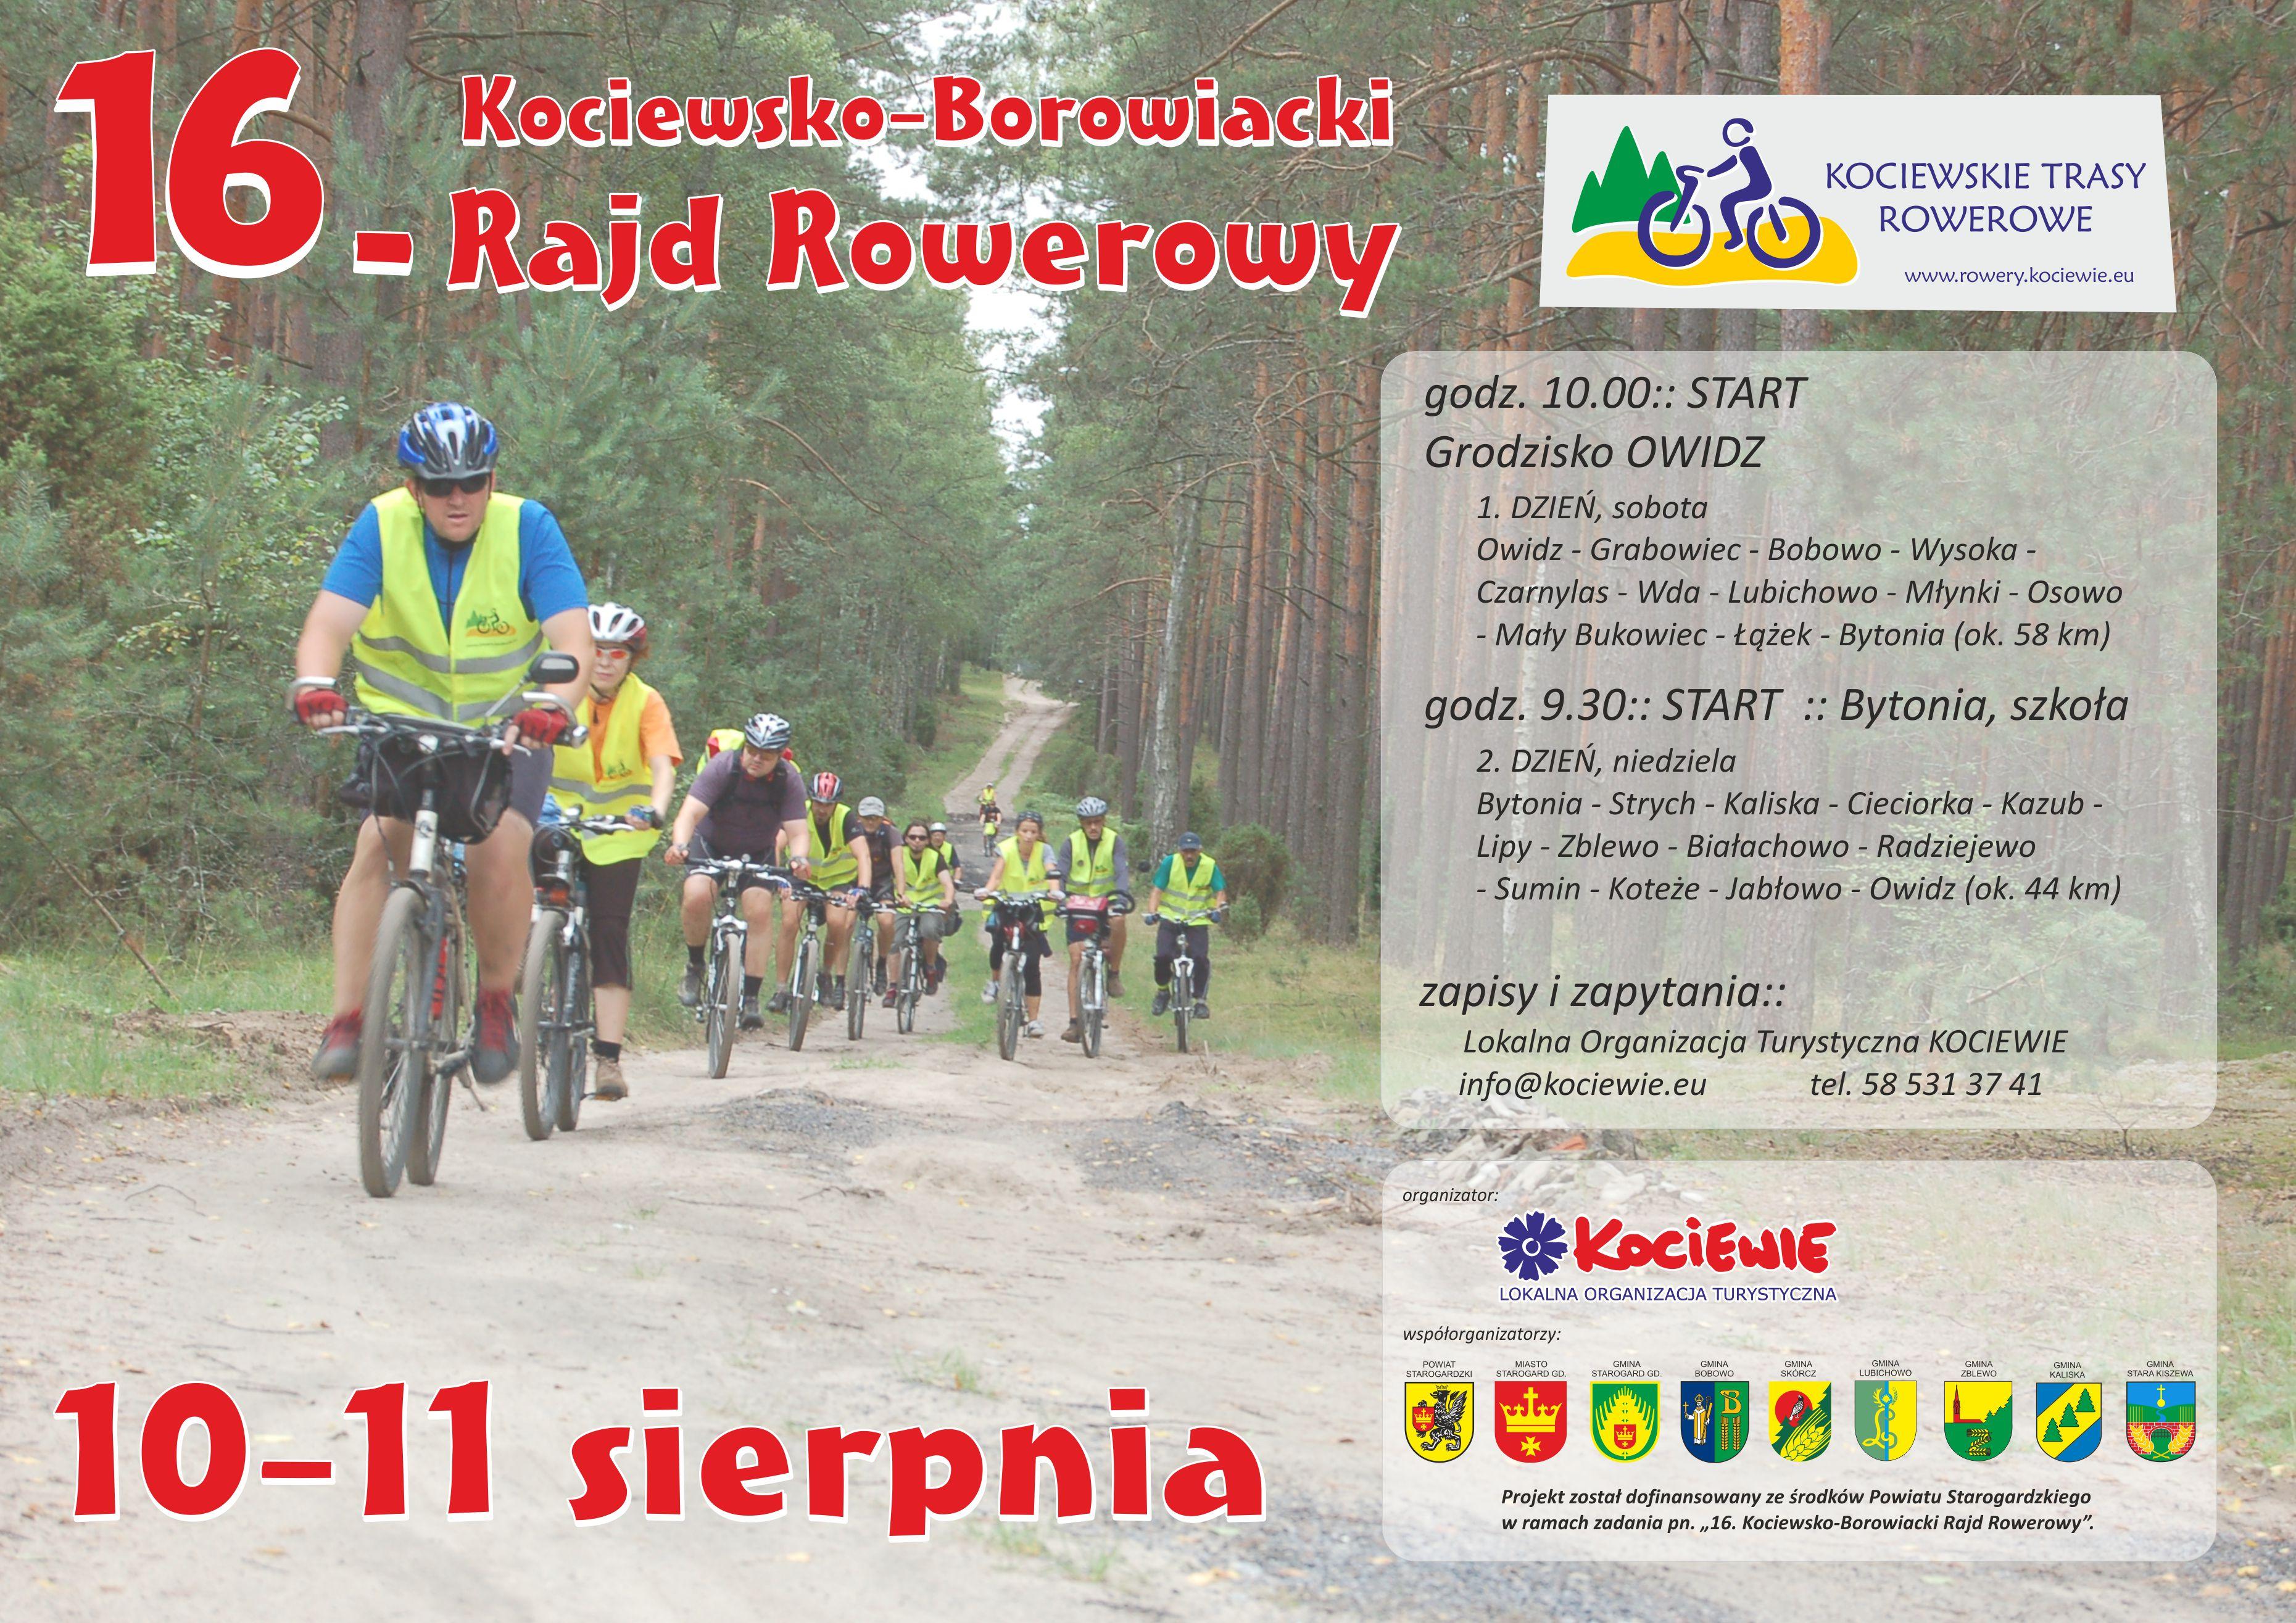 kociewsko-borowiacki-plakat2013.jpg